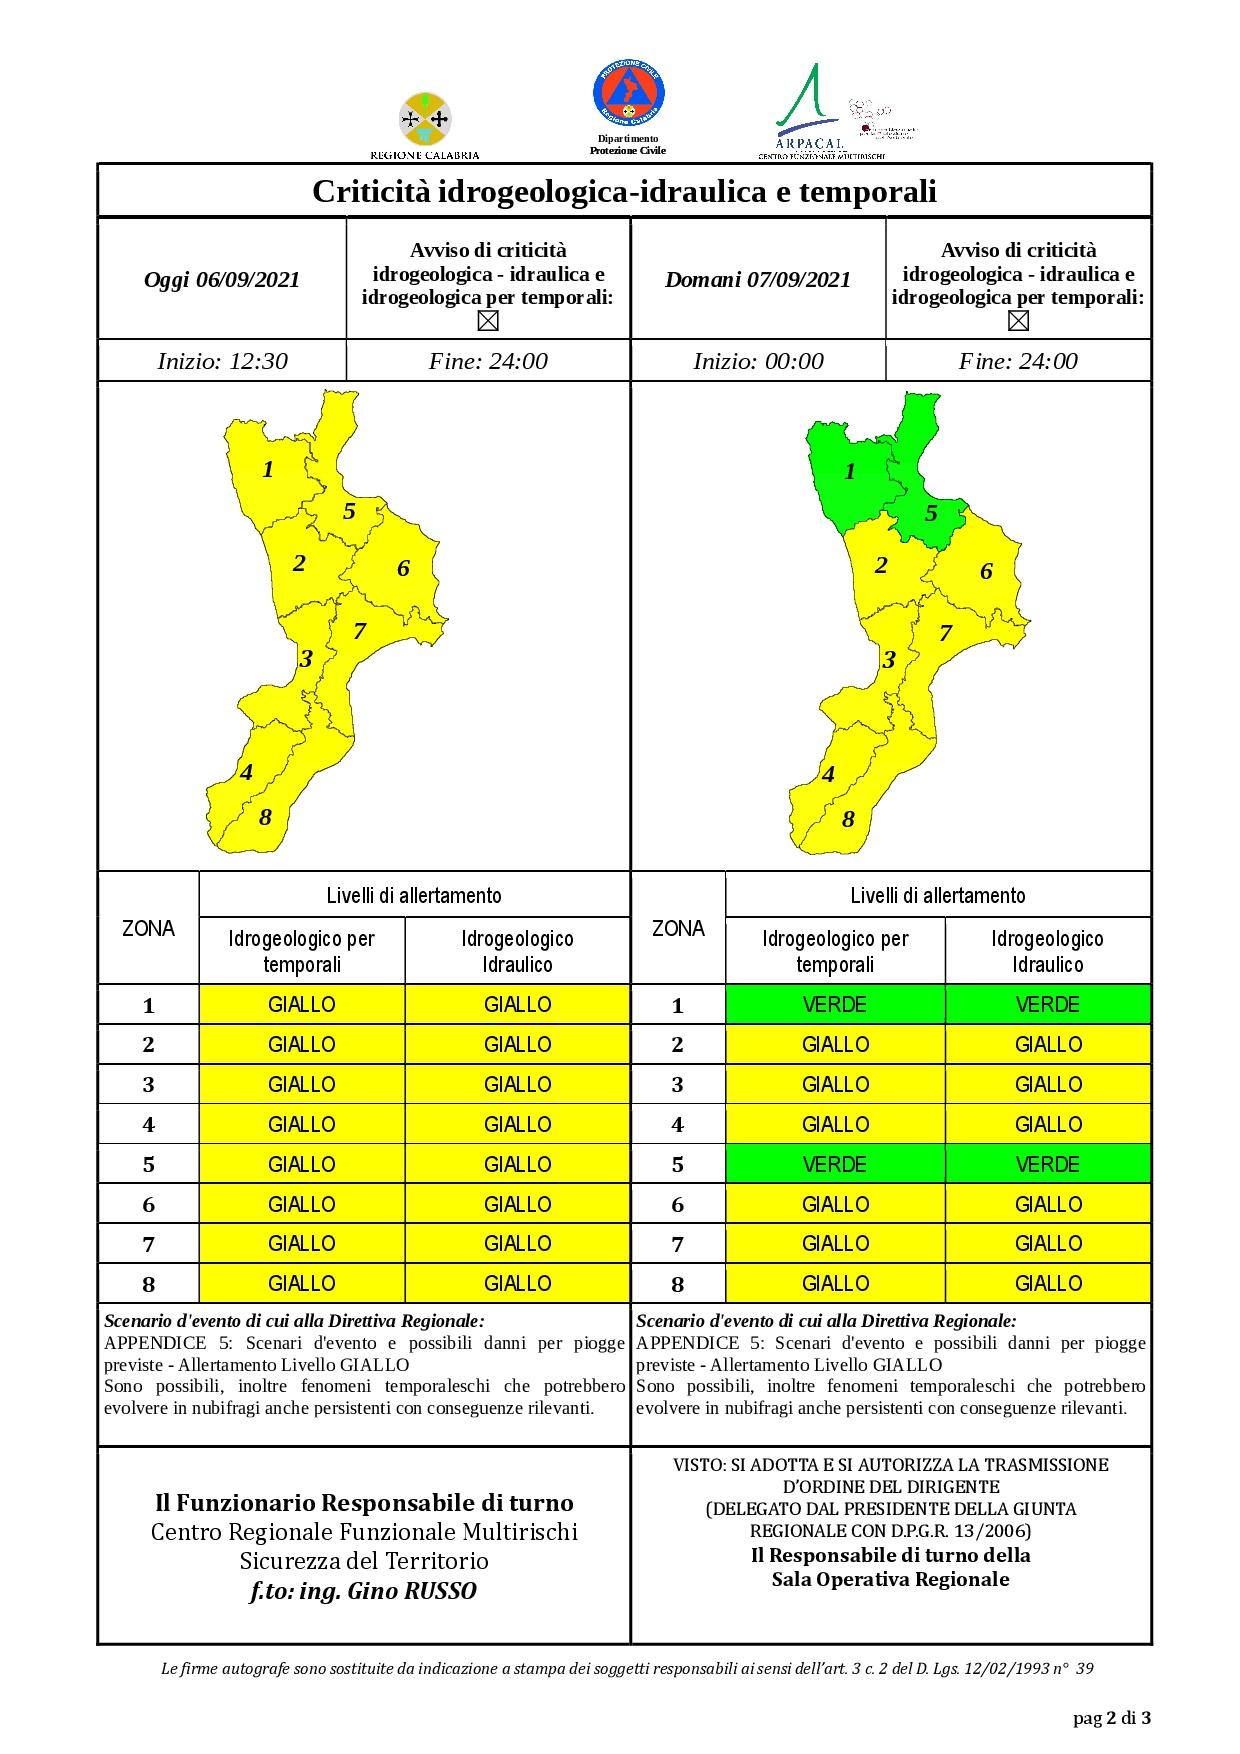 Criticità idrogeologica-idraulica e temporali in Calabria 06-09-2021